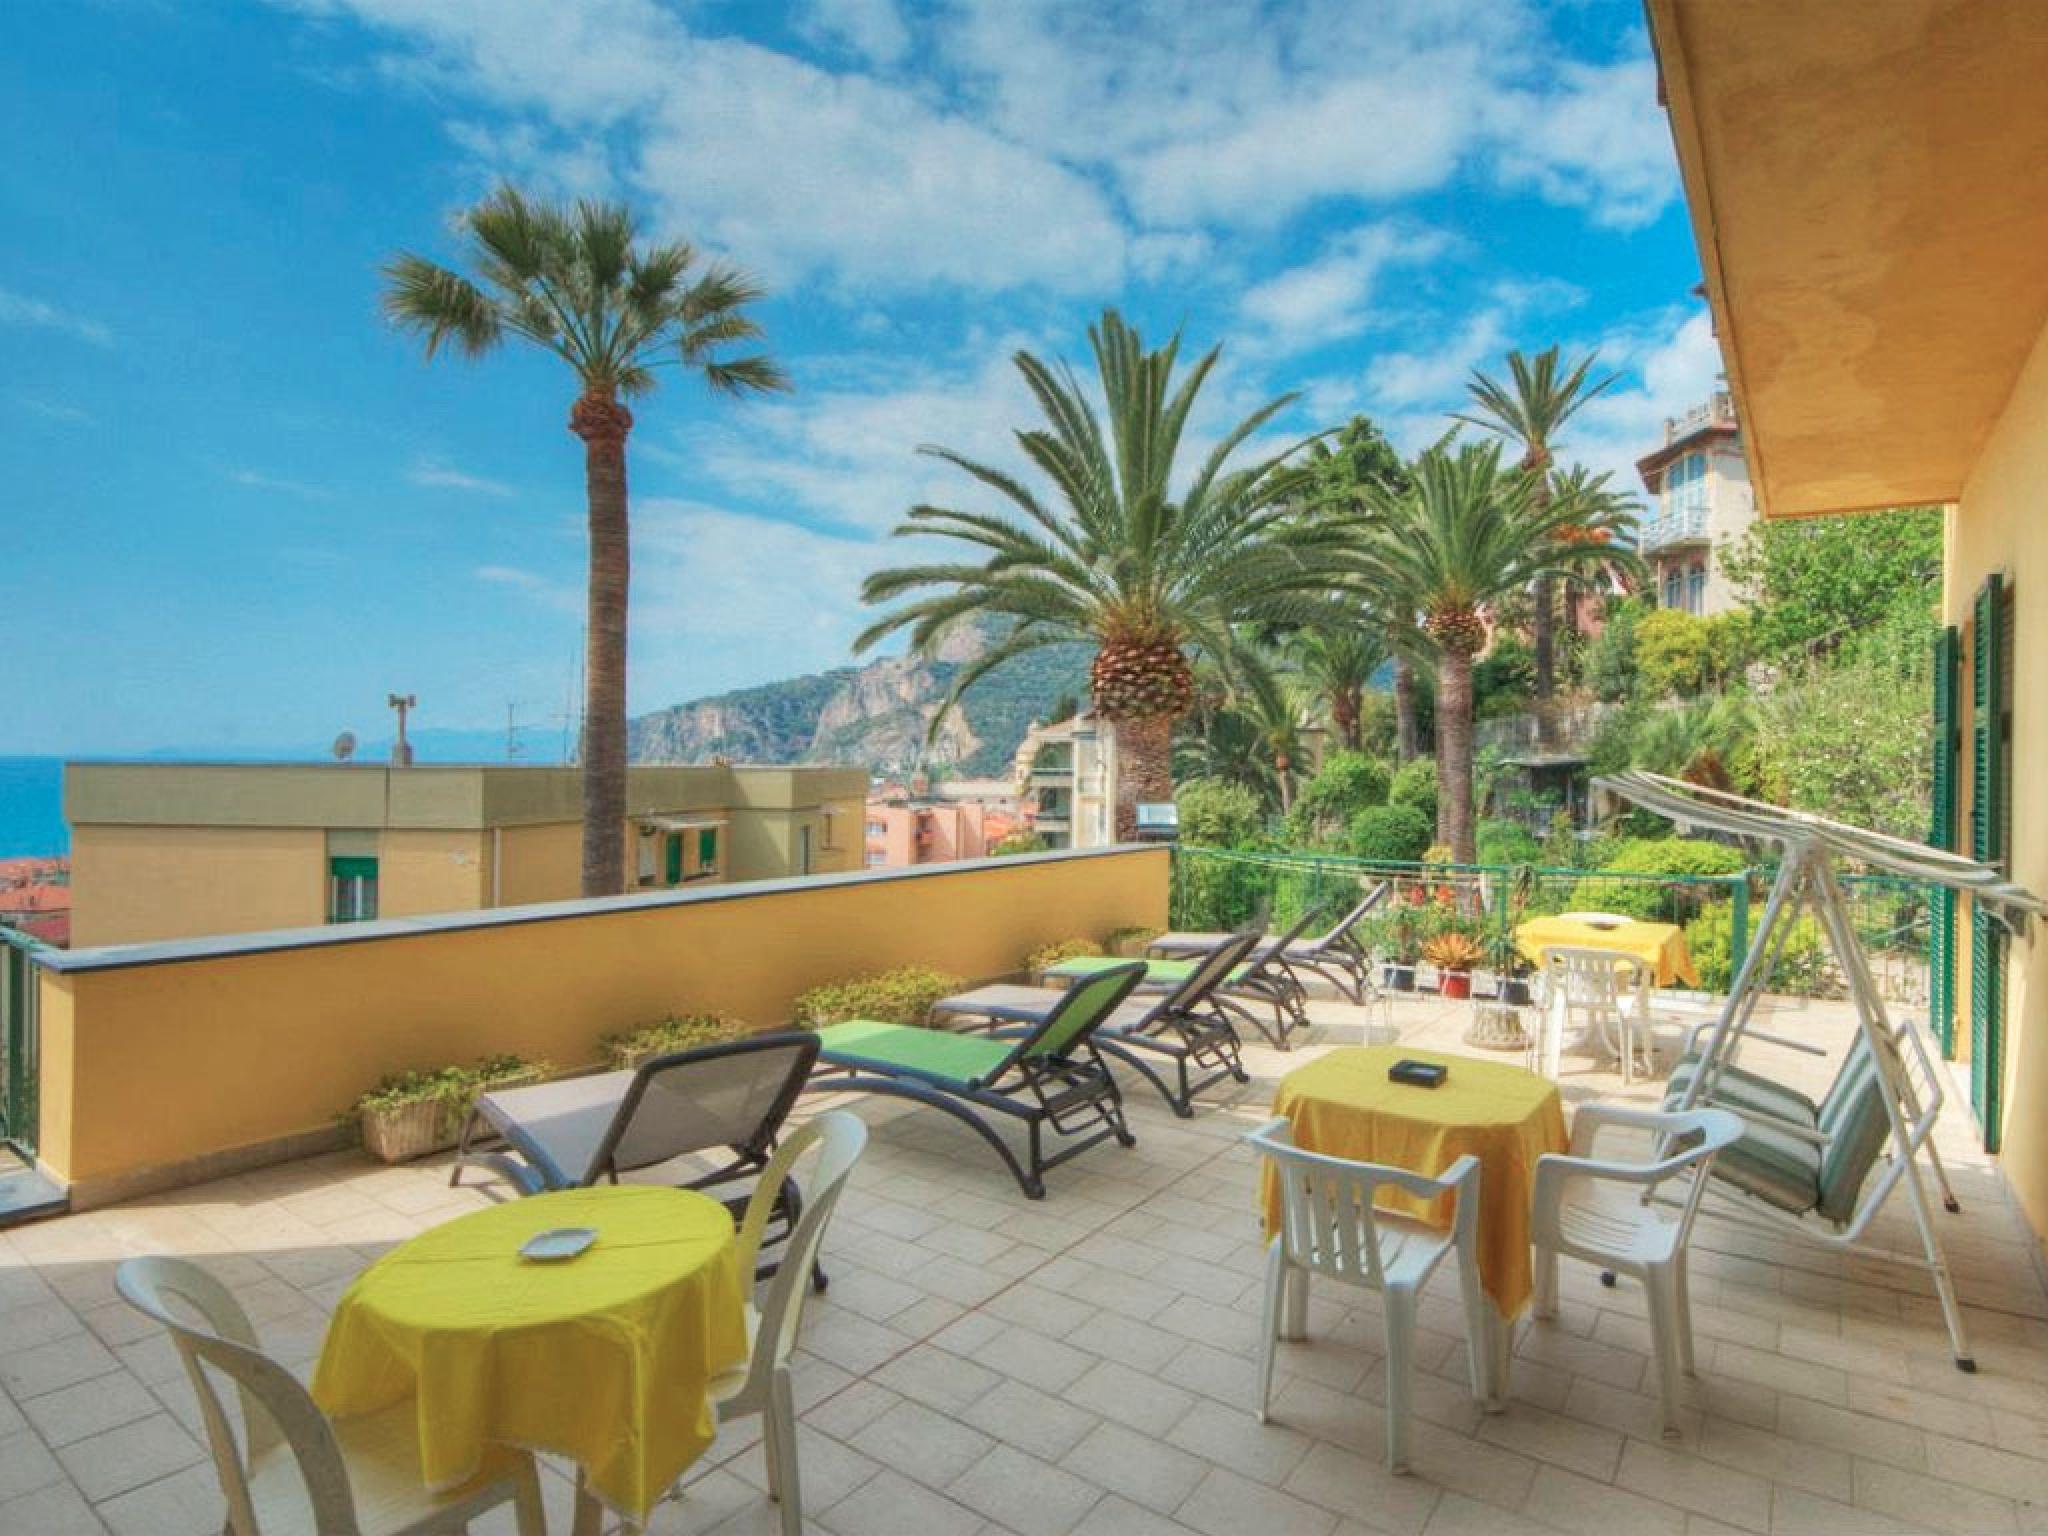 Bagni Blu Beach Vado Ligure : Hotel finale ligure cani animali ammessi dogwelcome hotel